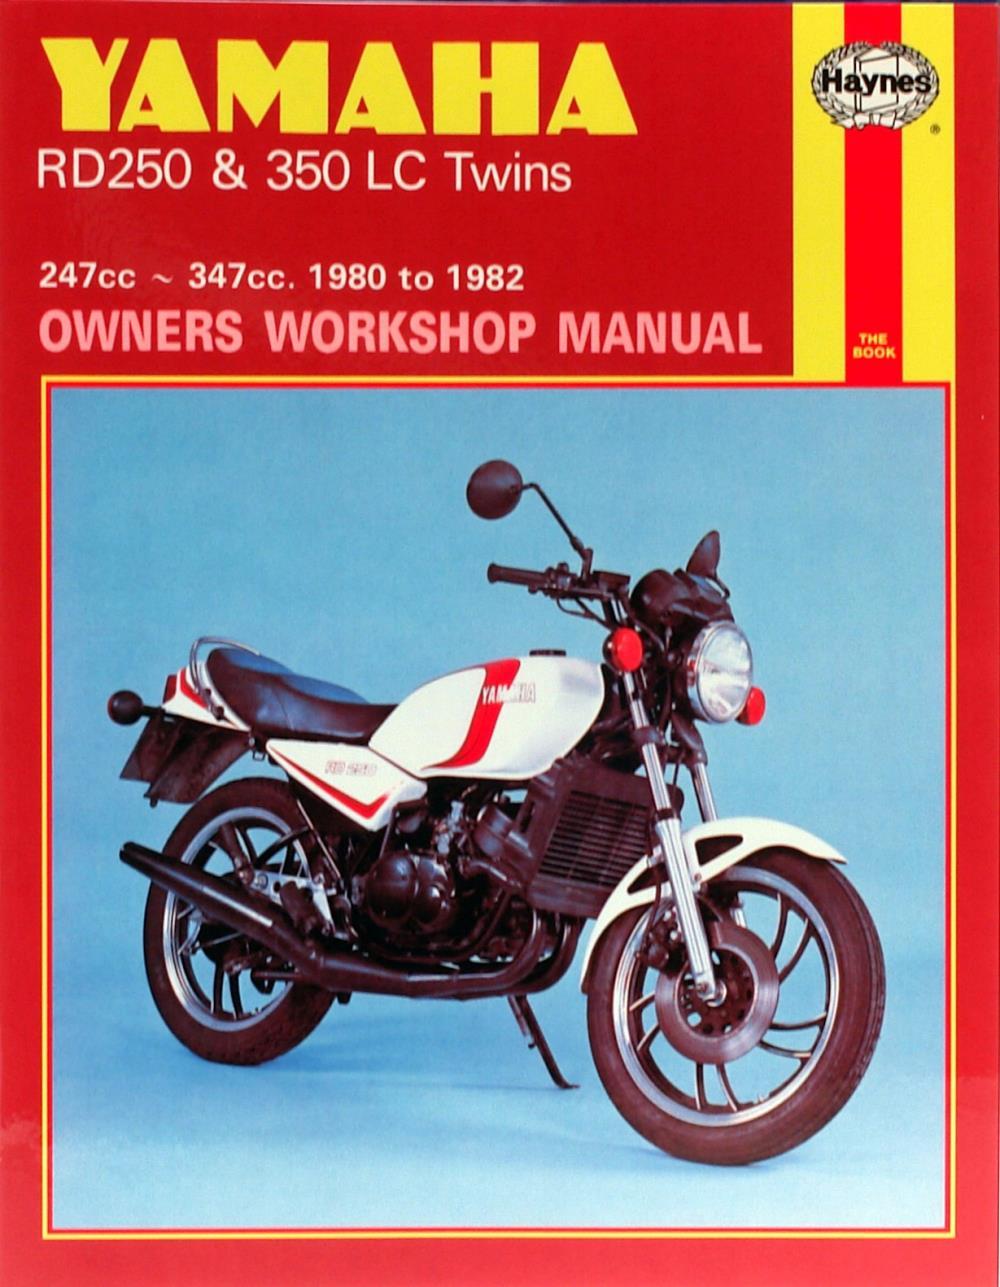 manual haynes for 1983 yamaha rd 350 lc ebay rh ebay co uk yamaha rd350 ypvs manual download yamaha rd350 ypvs manual download